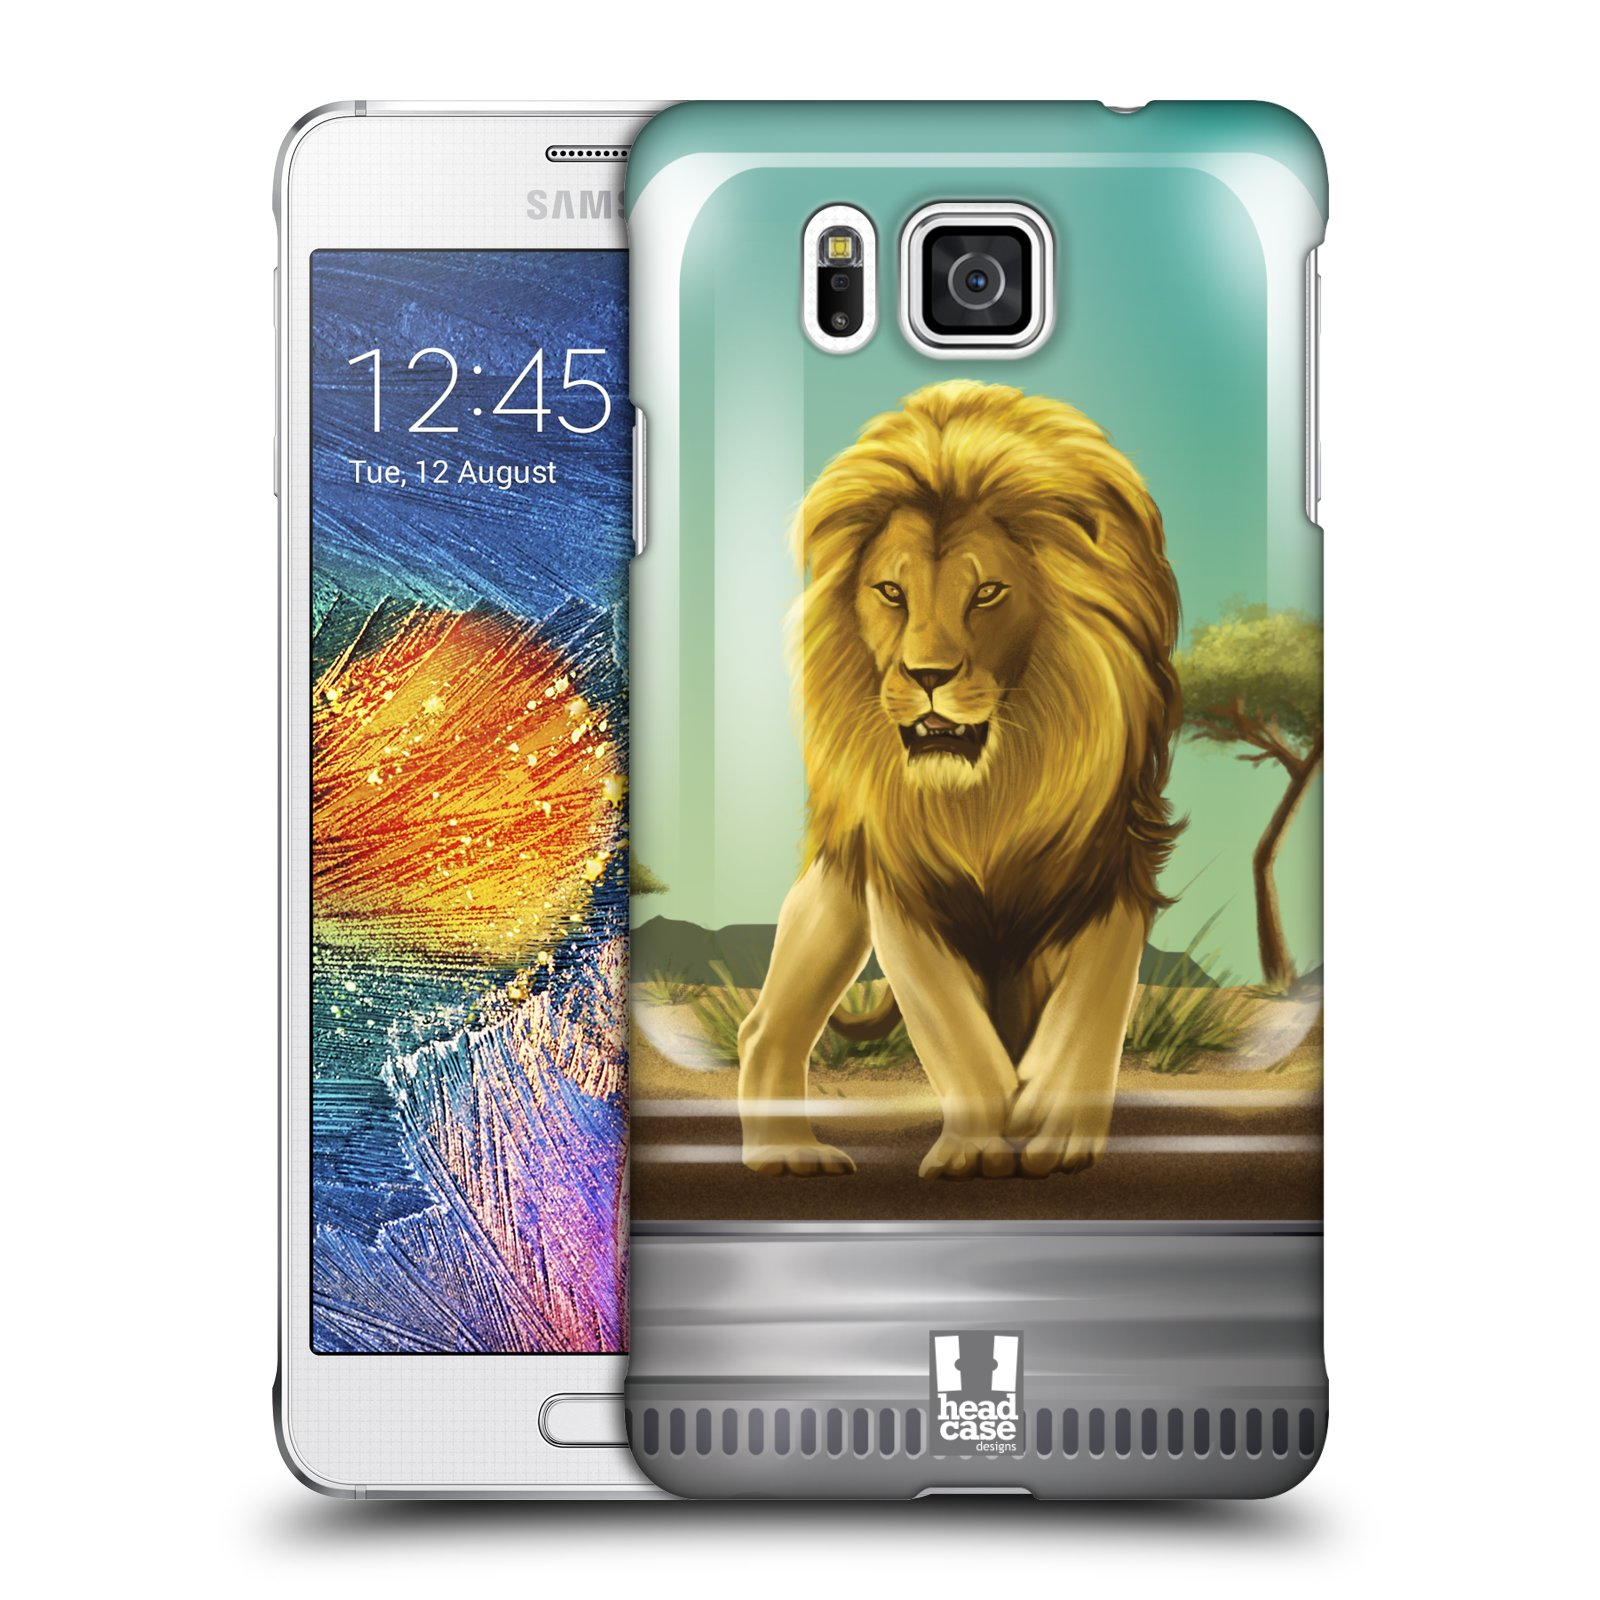 HEAD CASE plastový obal na mobil SAMSUNG Galaxy Alpha (G850) vzor Zvířátka v těžítku lev